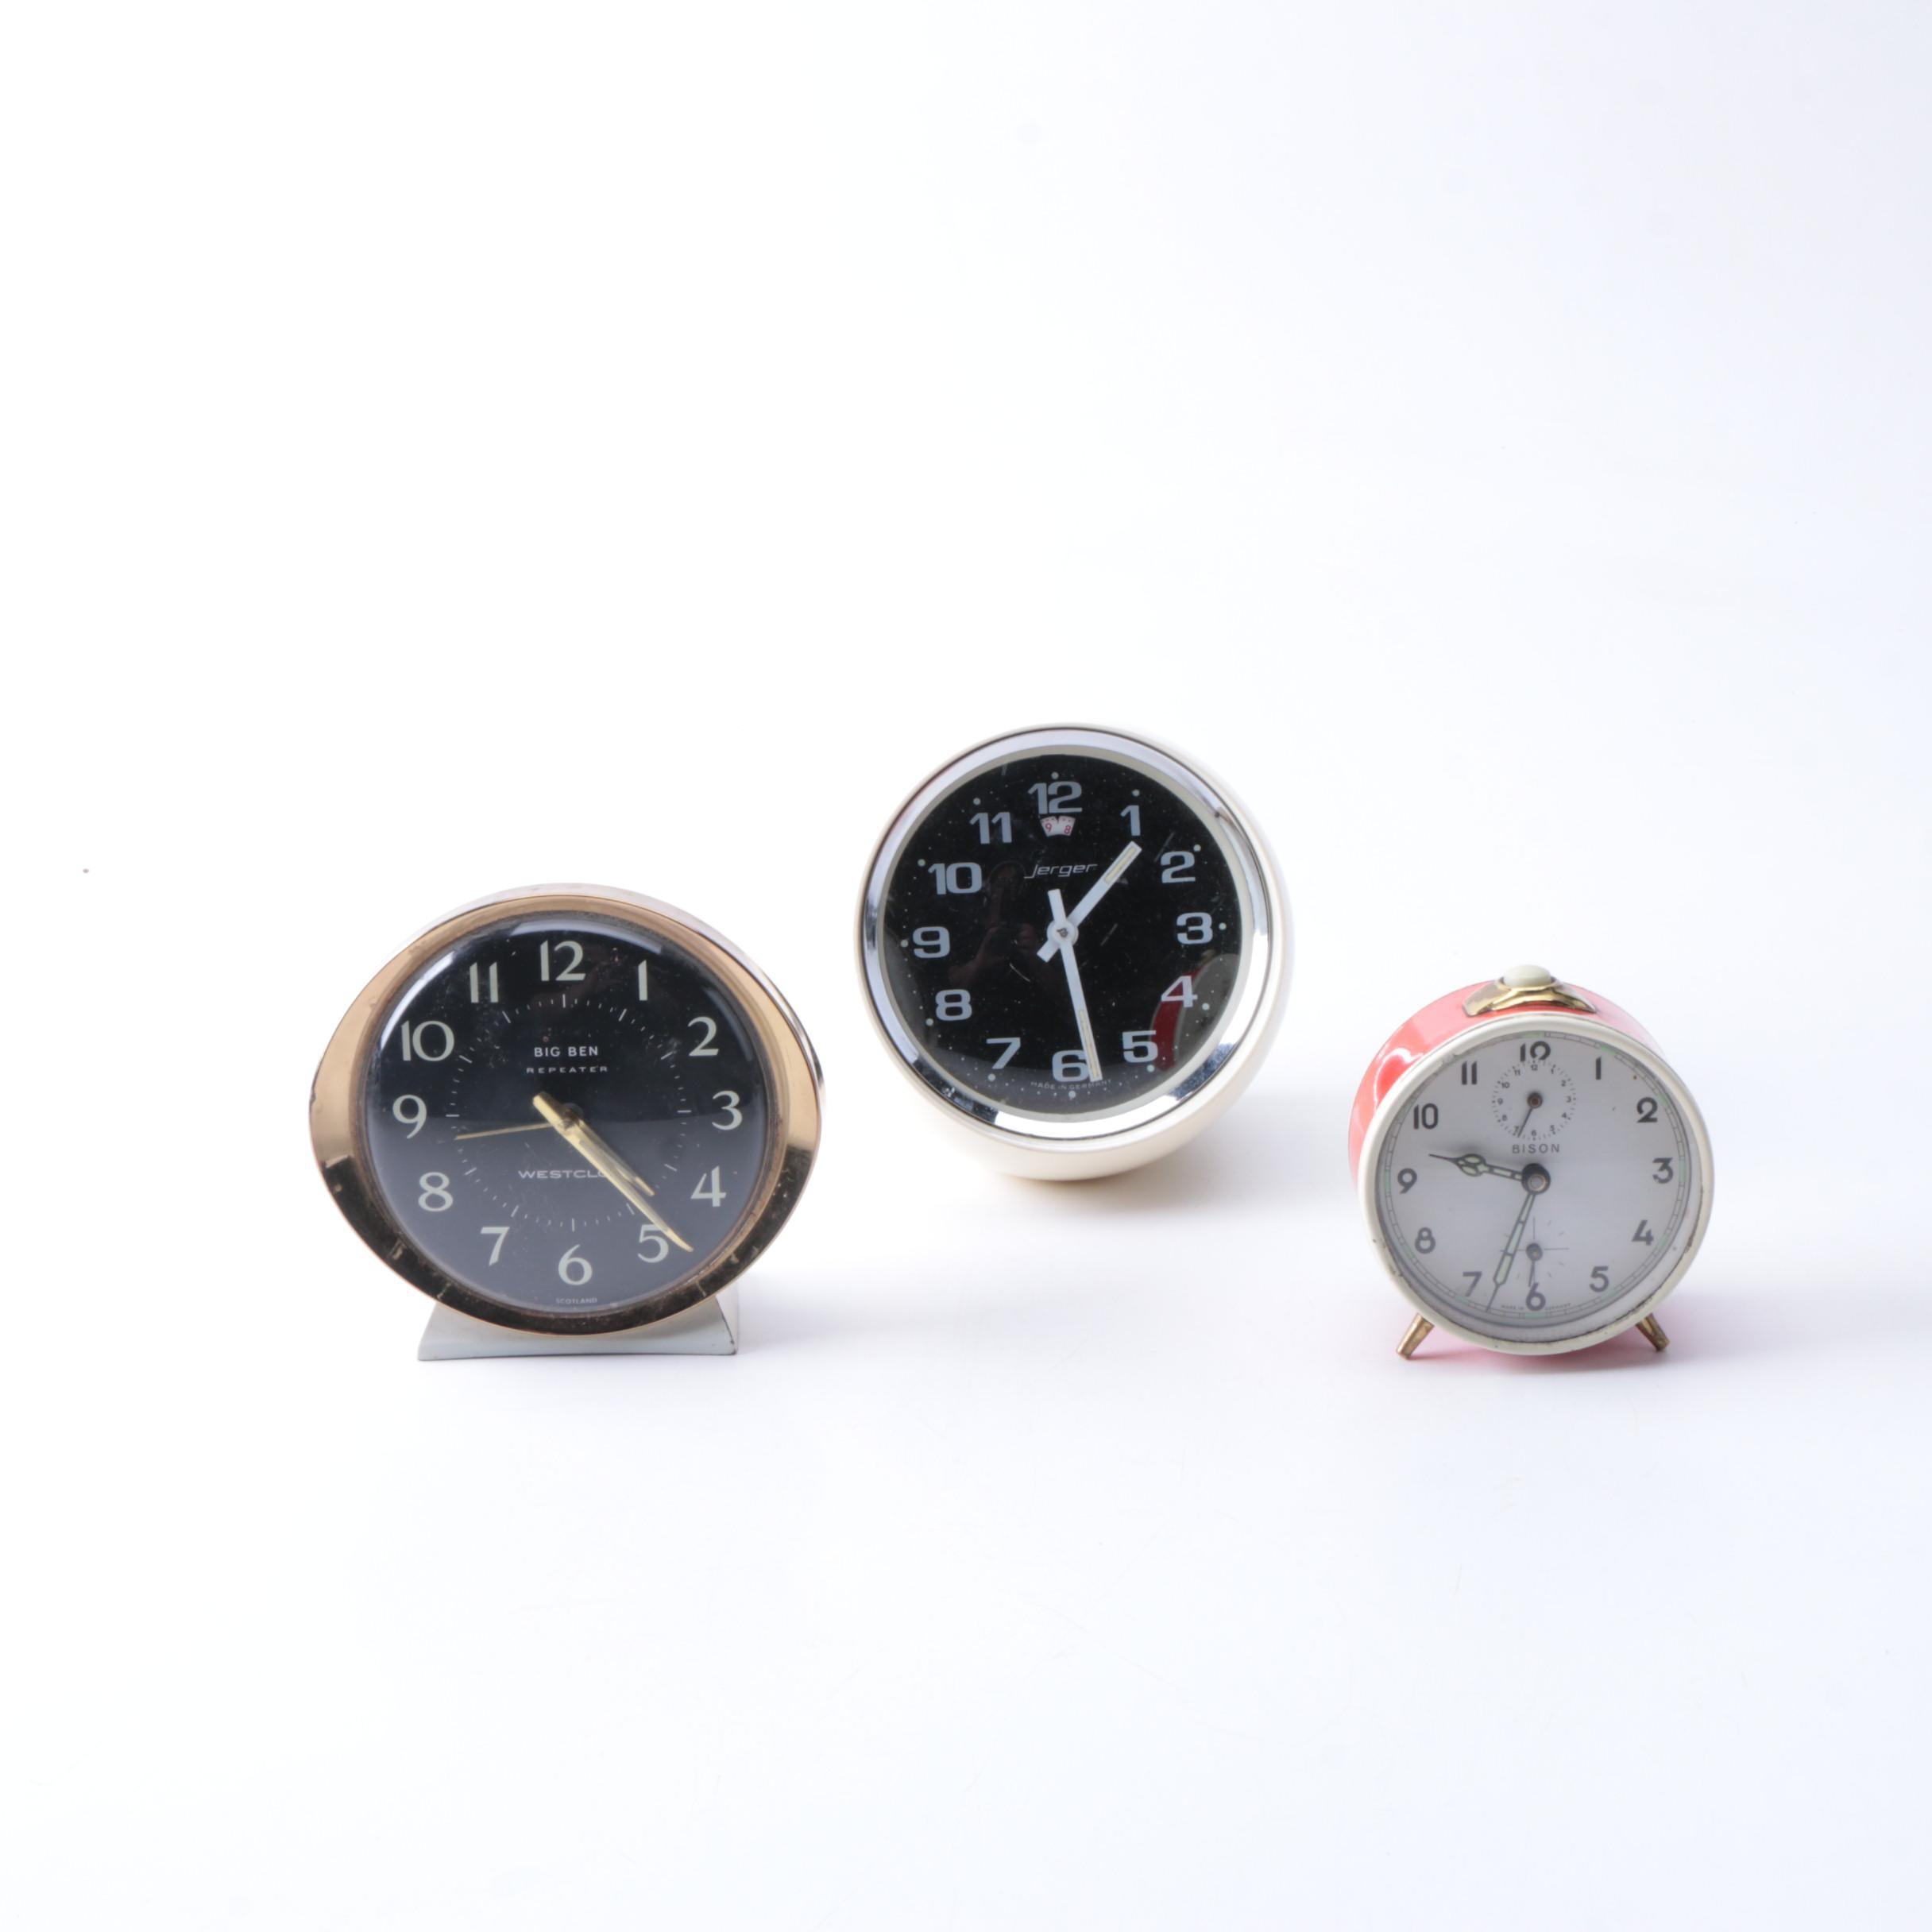 Retro Style Alarm Clocks